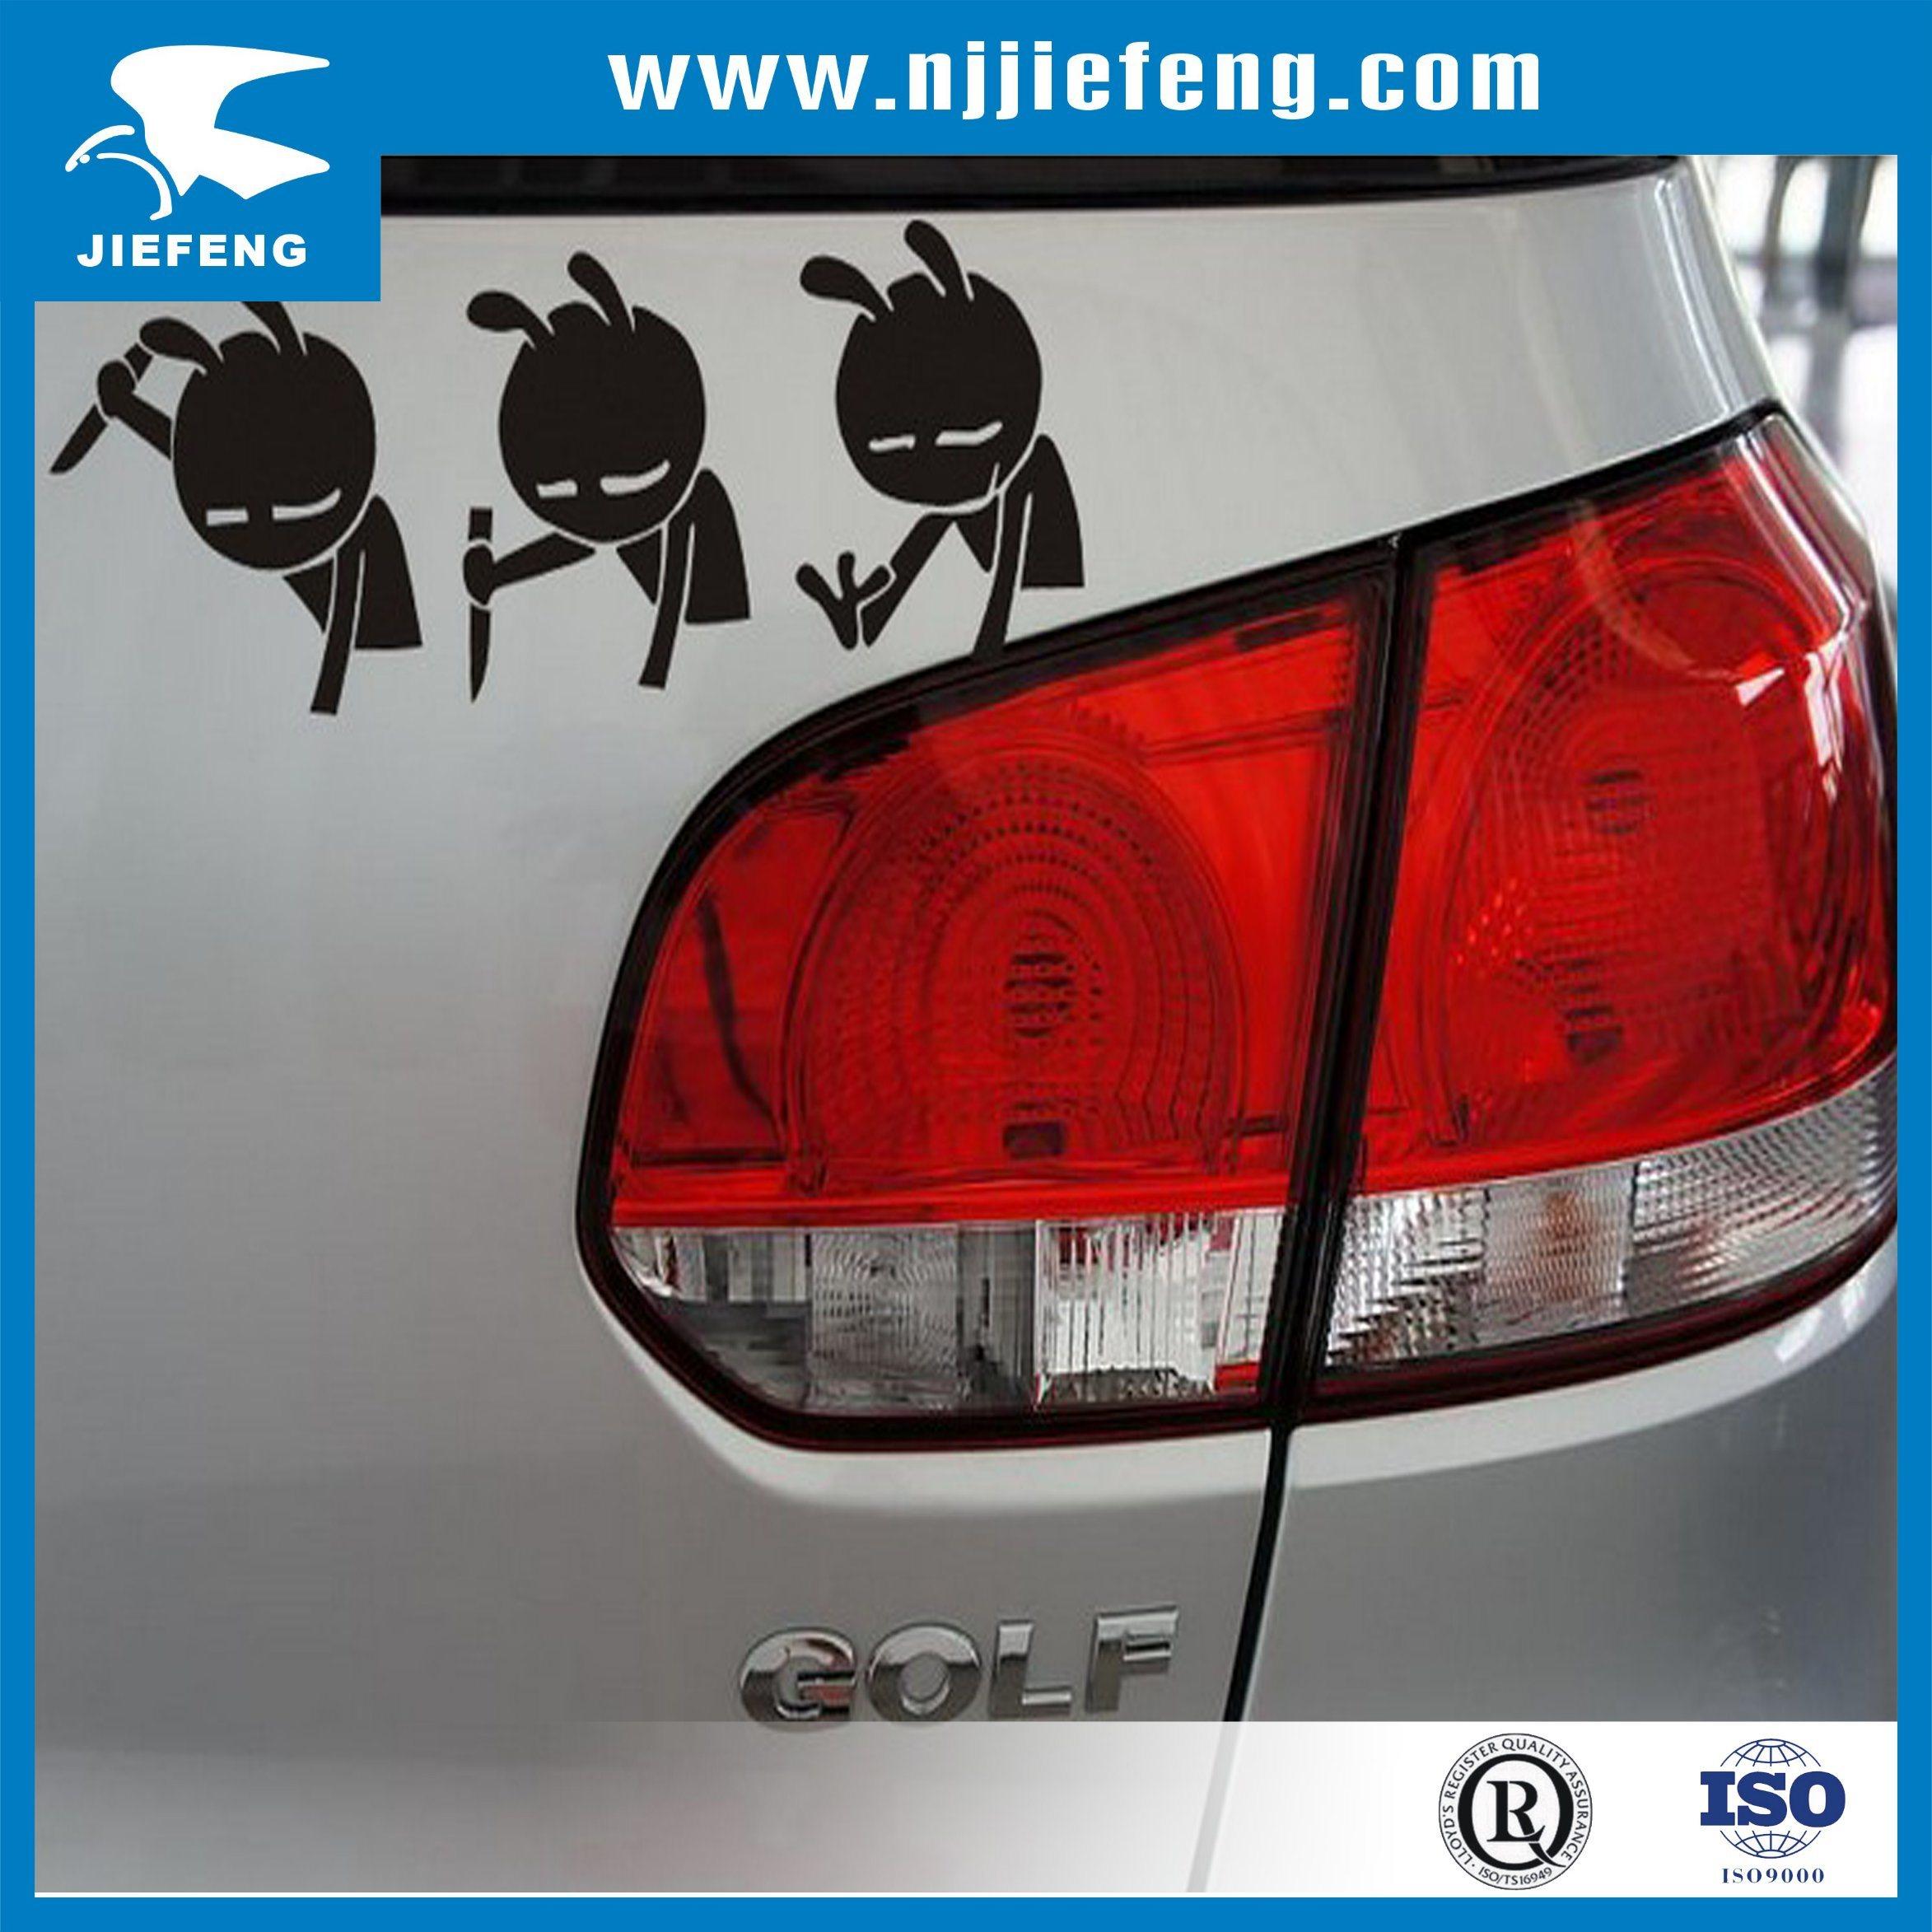 China supplier motorcycle atv dirt bike sticker decal china sticker motorcycle decal